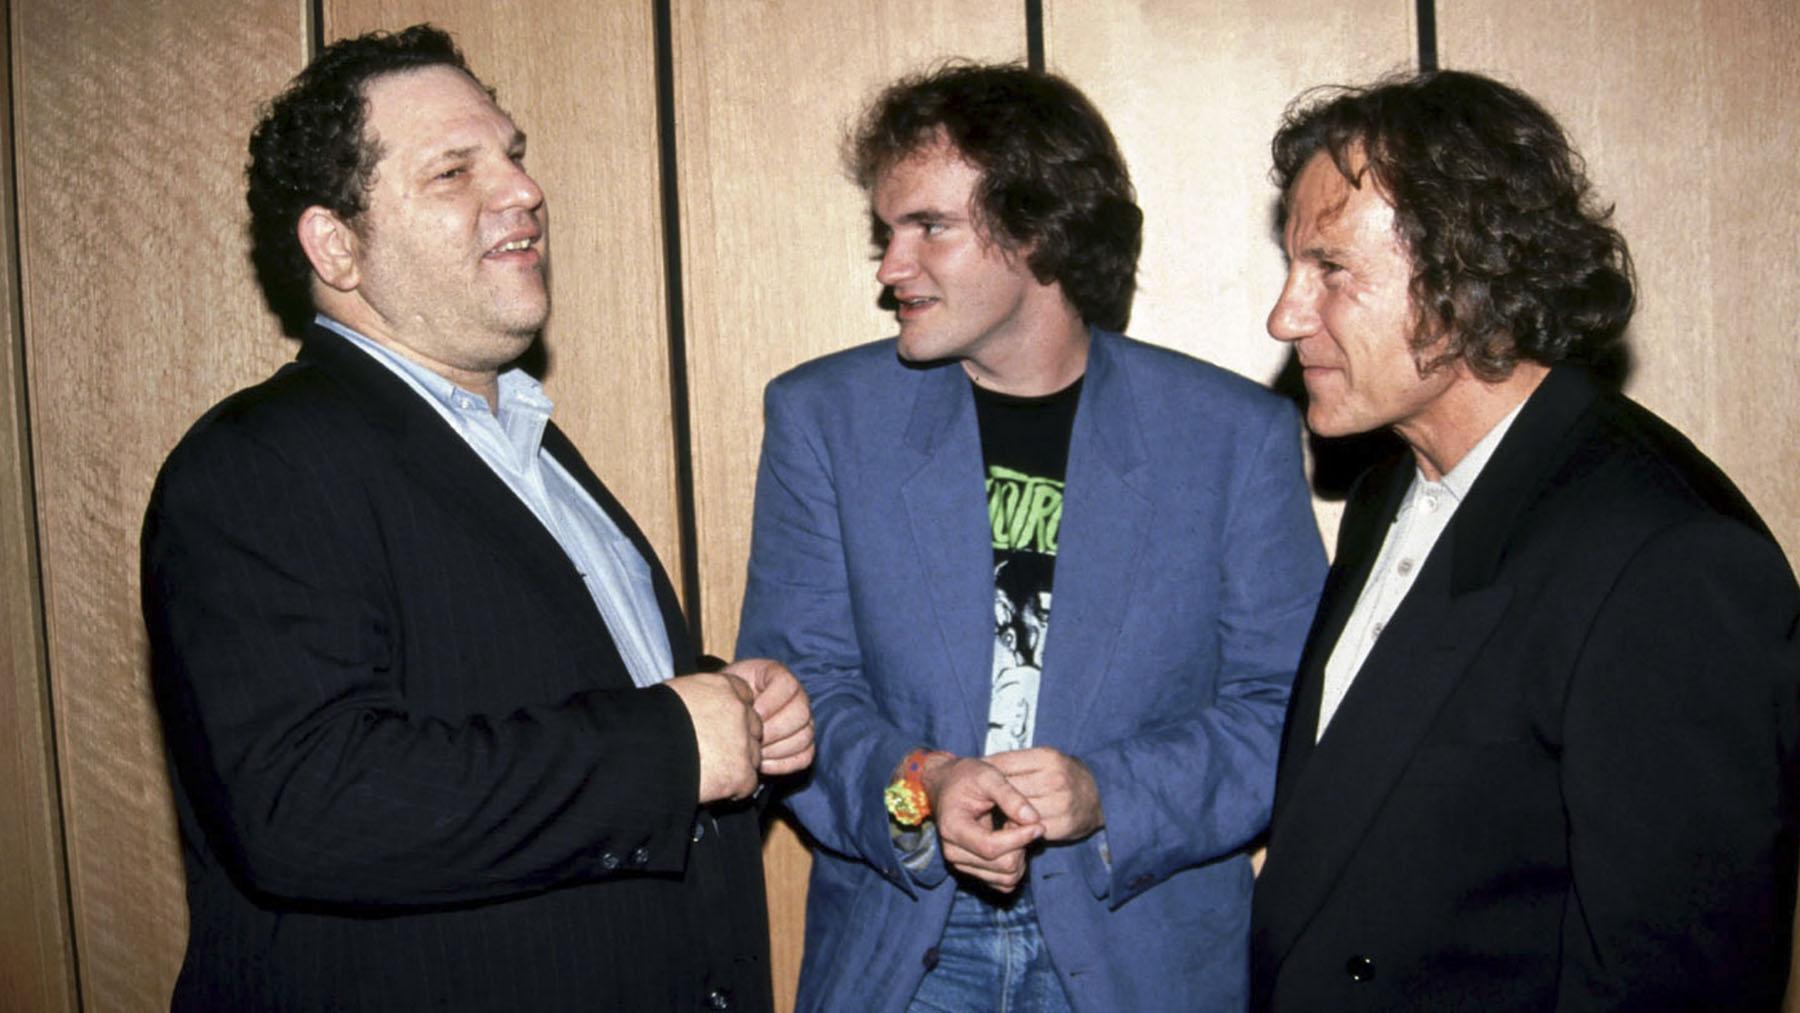 Harvey Wenstein, Quentin Tarantino y Harvey Keitel (Copyright Le Pacte)